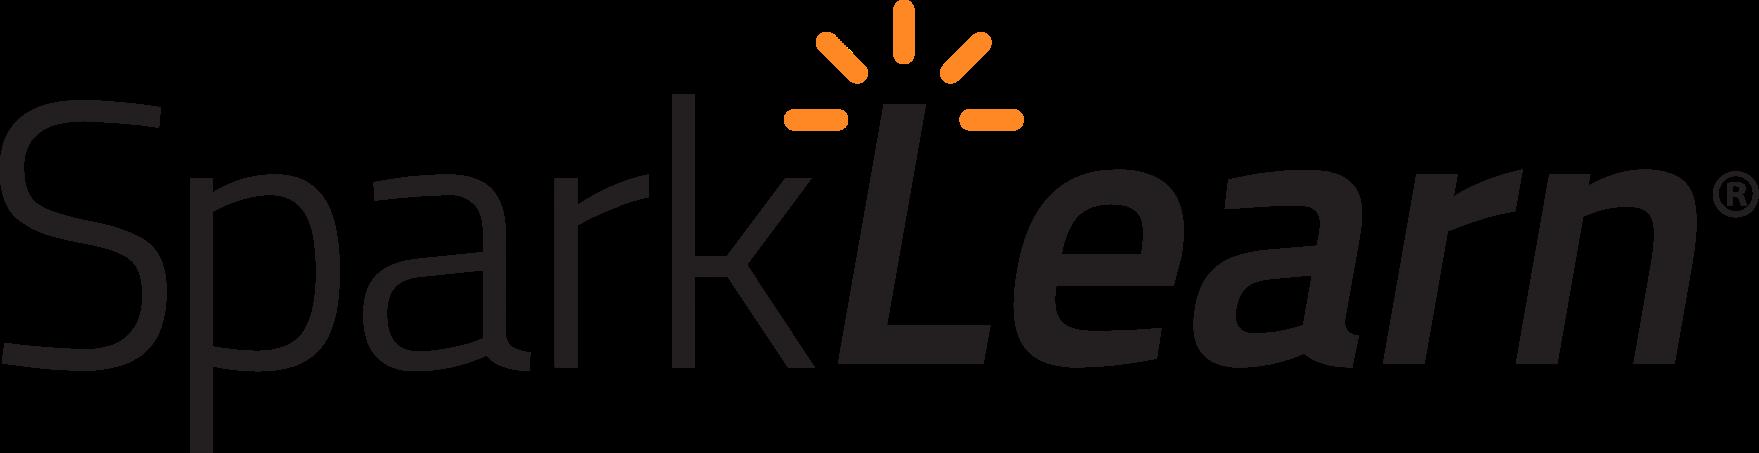 SL_logo_white-1